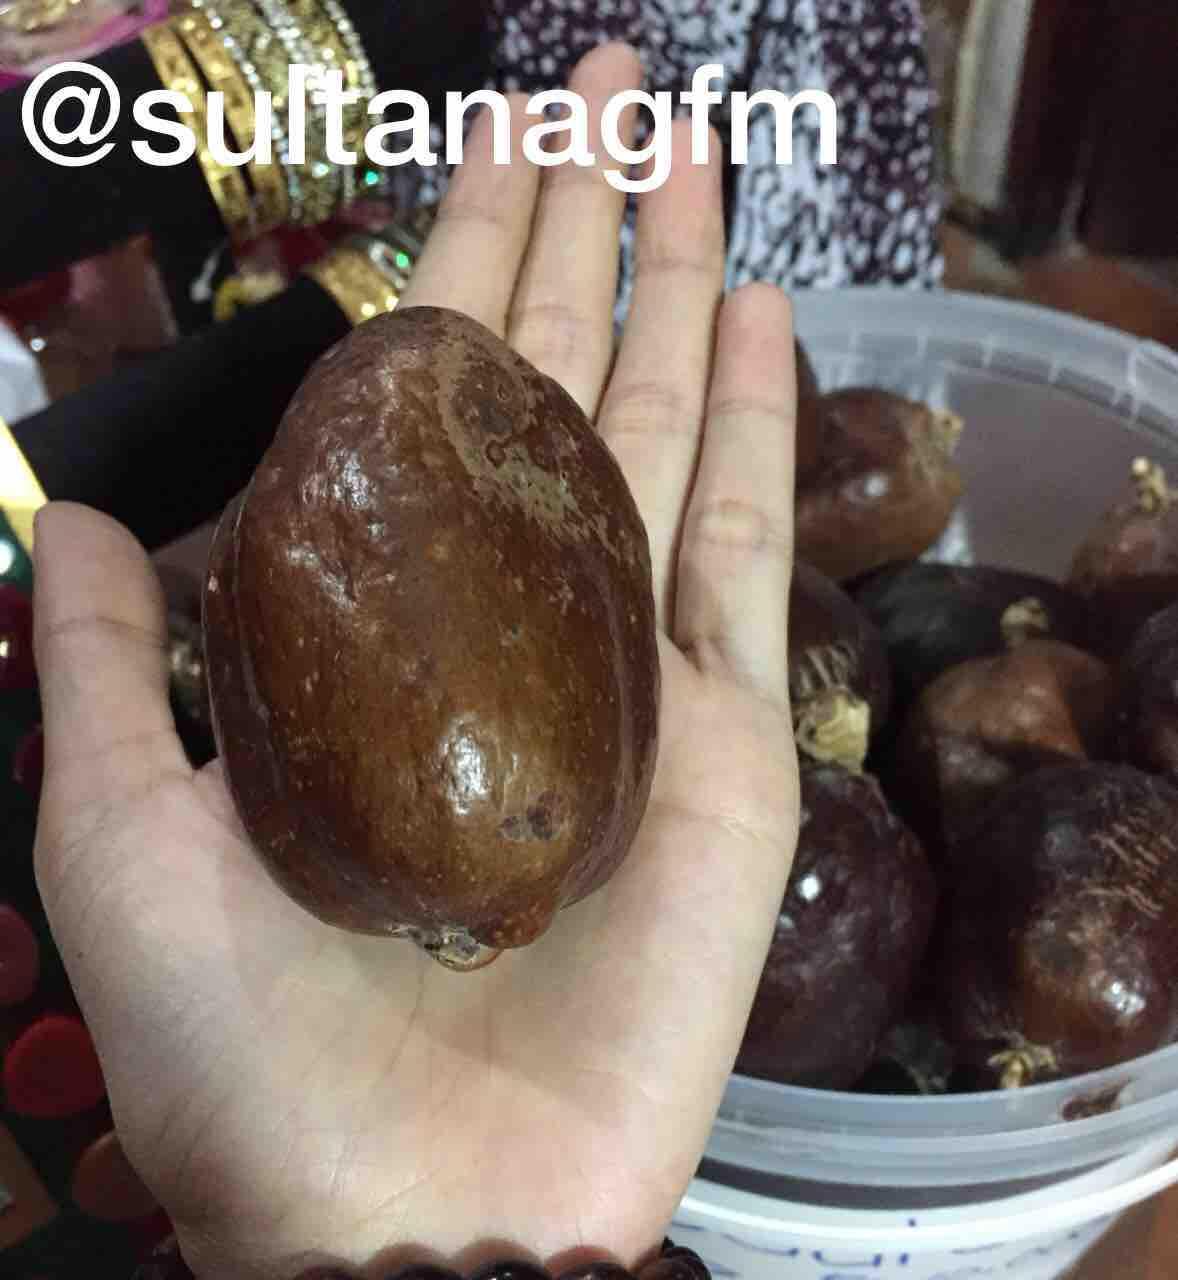 Fruity Rainbow Soap 10 in 1 Whitening Soap Fruitamin Original Sabun Pemutih Badan BPOM - 1Pc. Rp13.500. Rp58.000 -77%. (239). DKI Jakarta. Buah zuriat